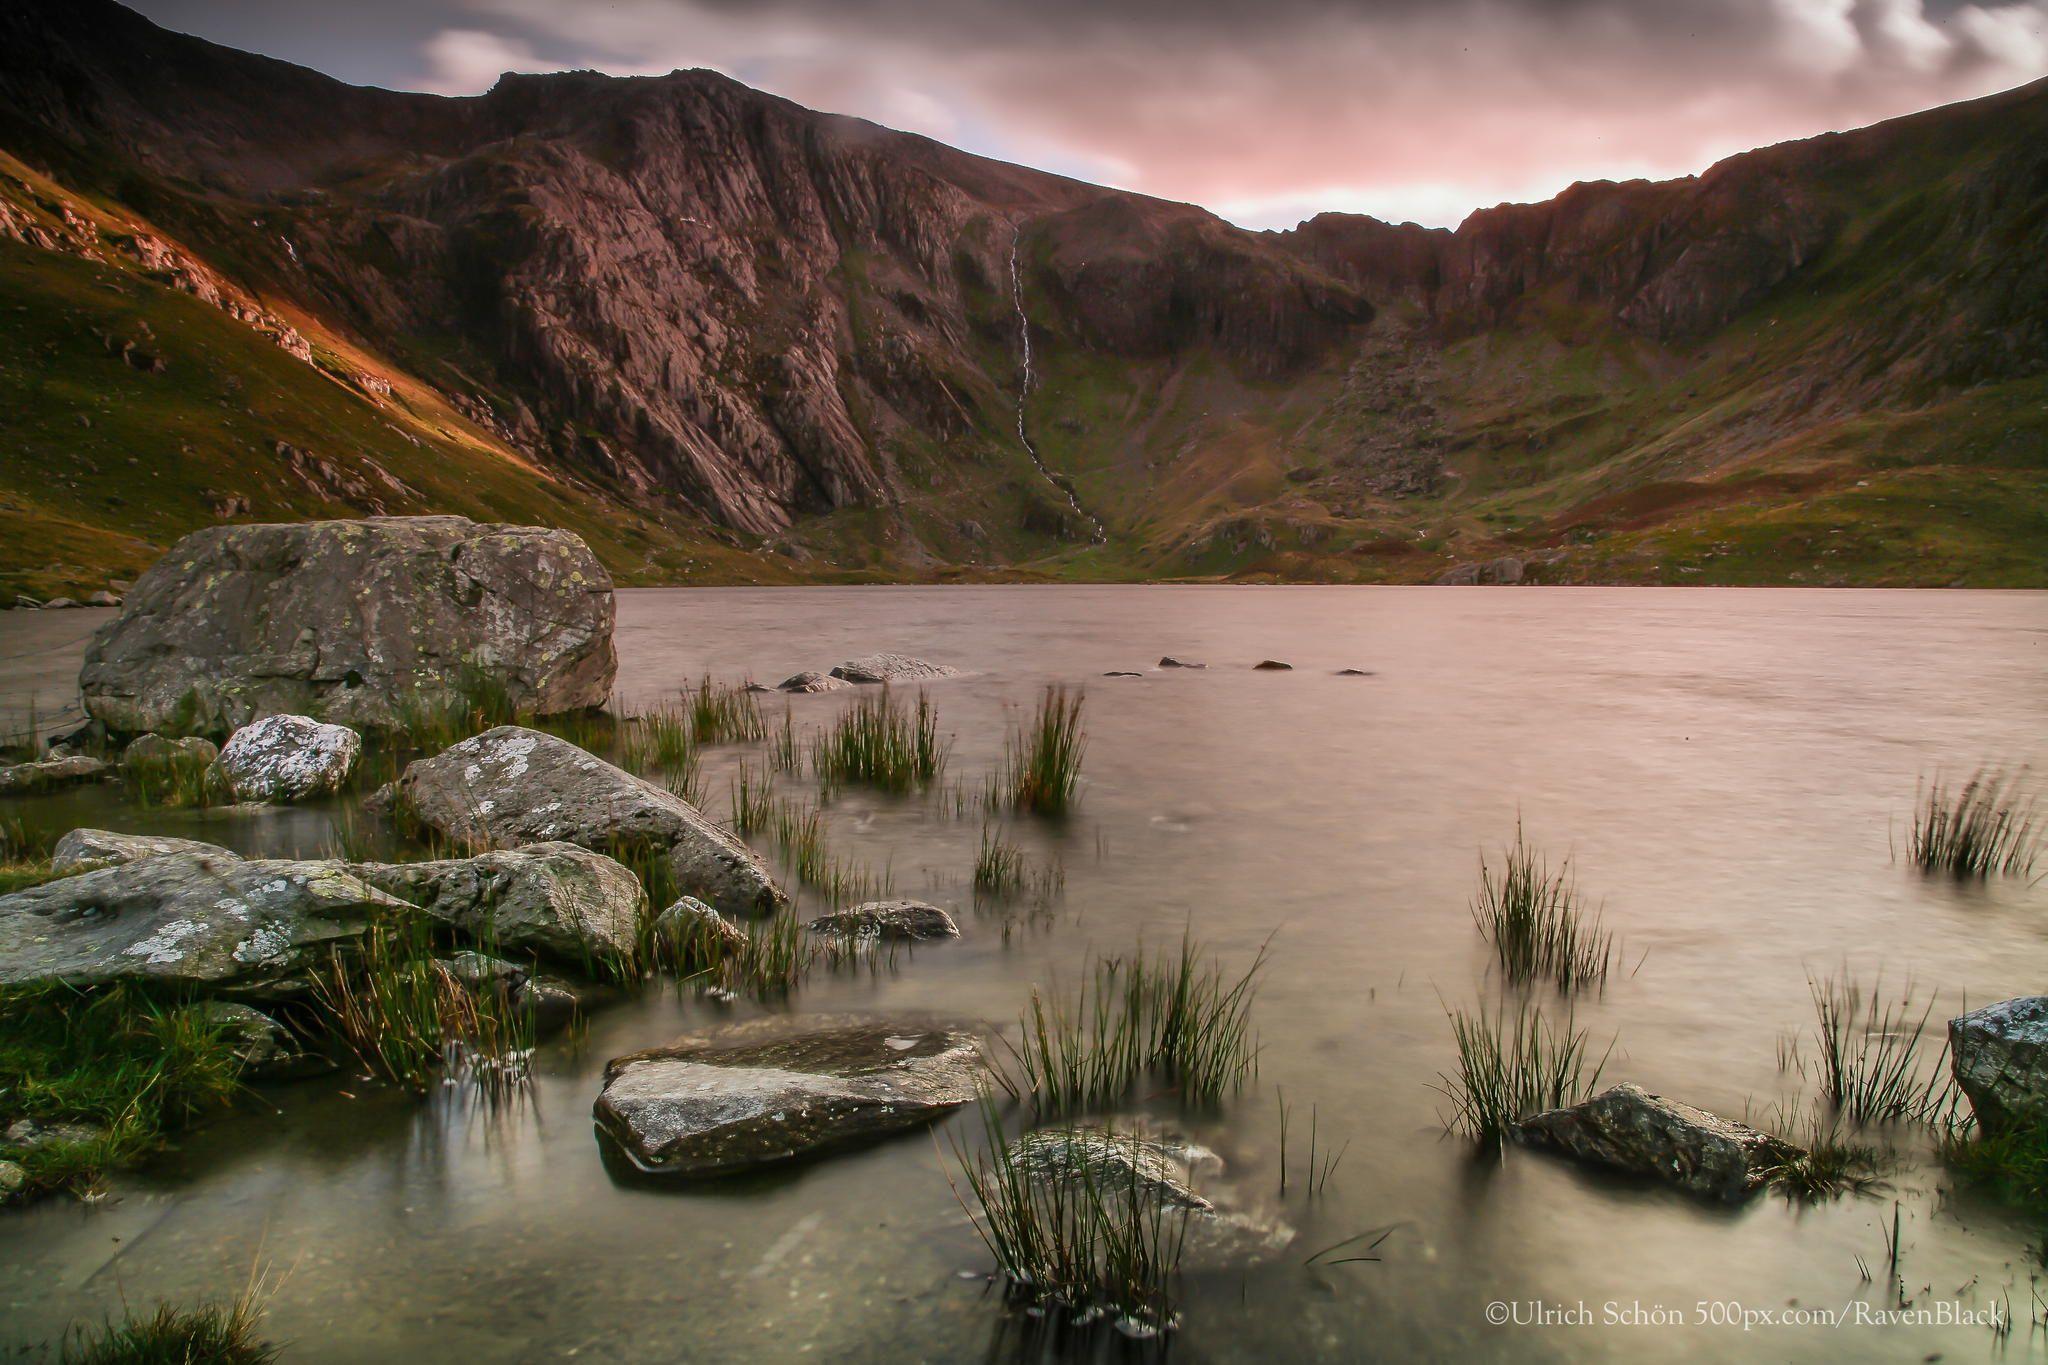 Shortly before dusk by Ulrich Schoen on 500px. Snowdonia, Wales, UK